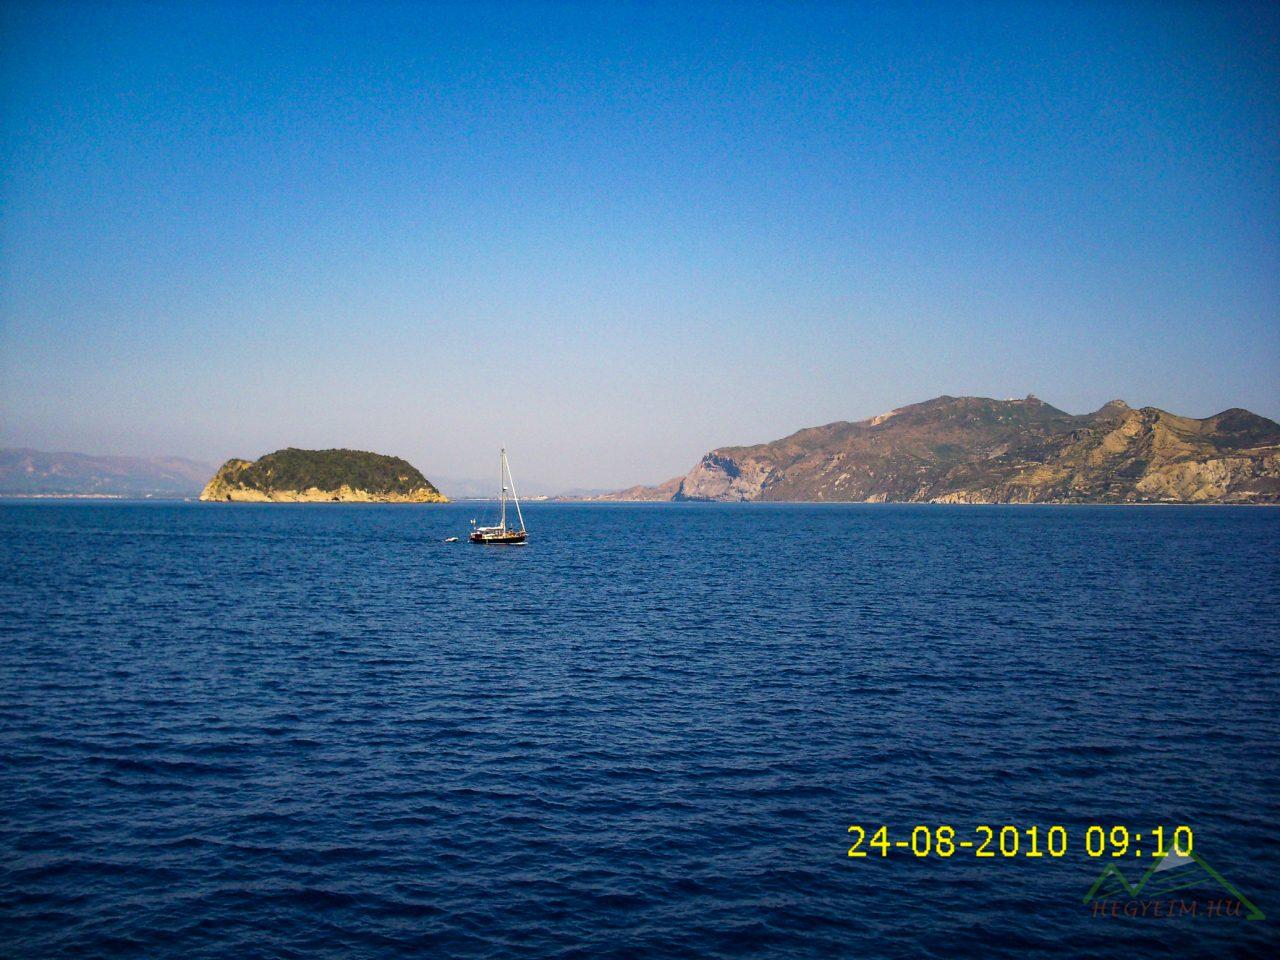 Kalonissi szigetet